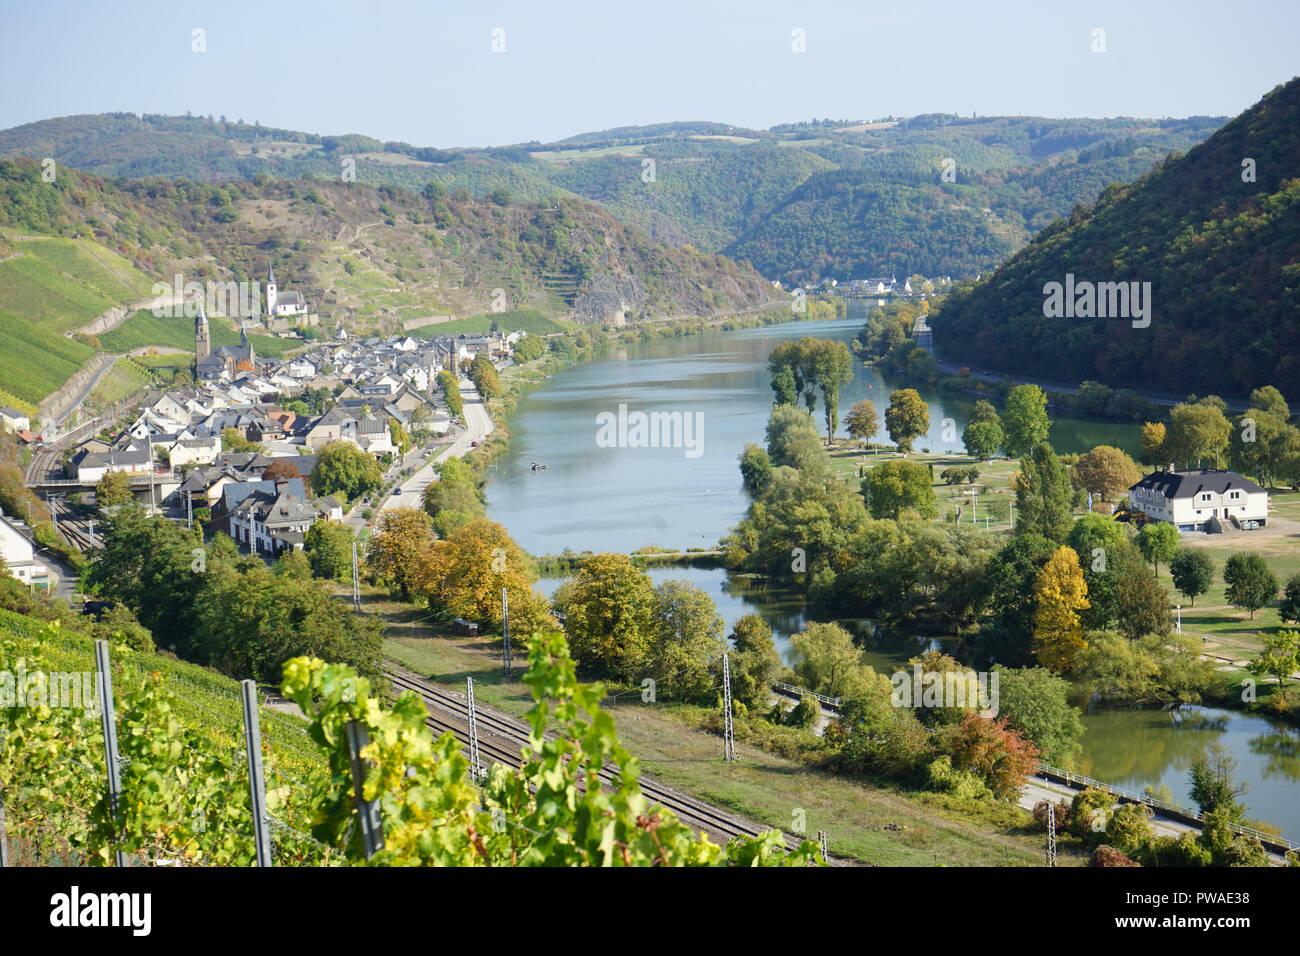 Blick auf Hatzenport, Moselsteig, Terrassenmosel, Moseltal, Mosel, Rheinland Pfalz, Deutschland - Stock Image